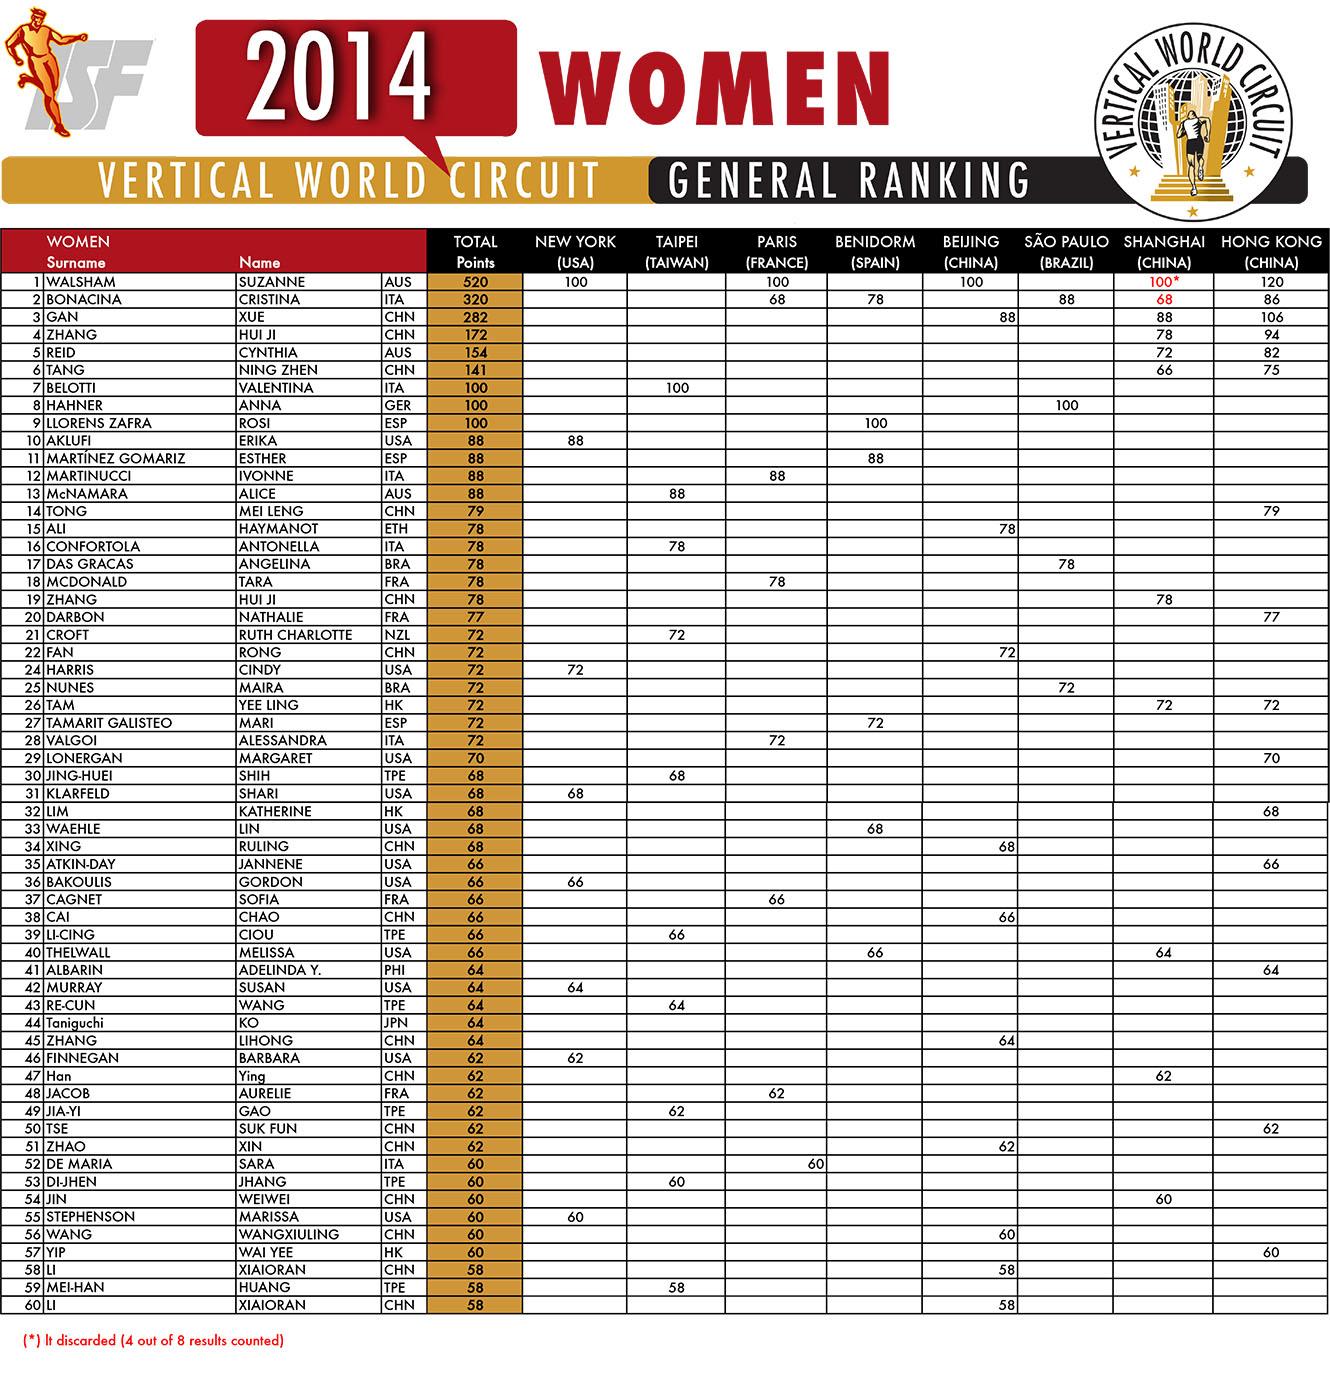 2014-ranking-men-women-DICEMBRE.xls